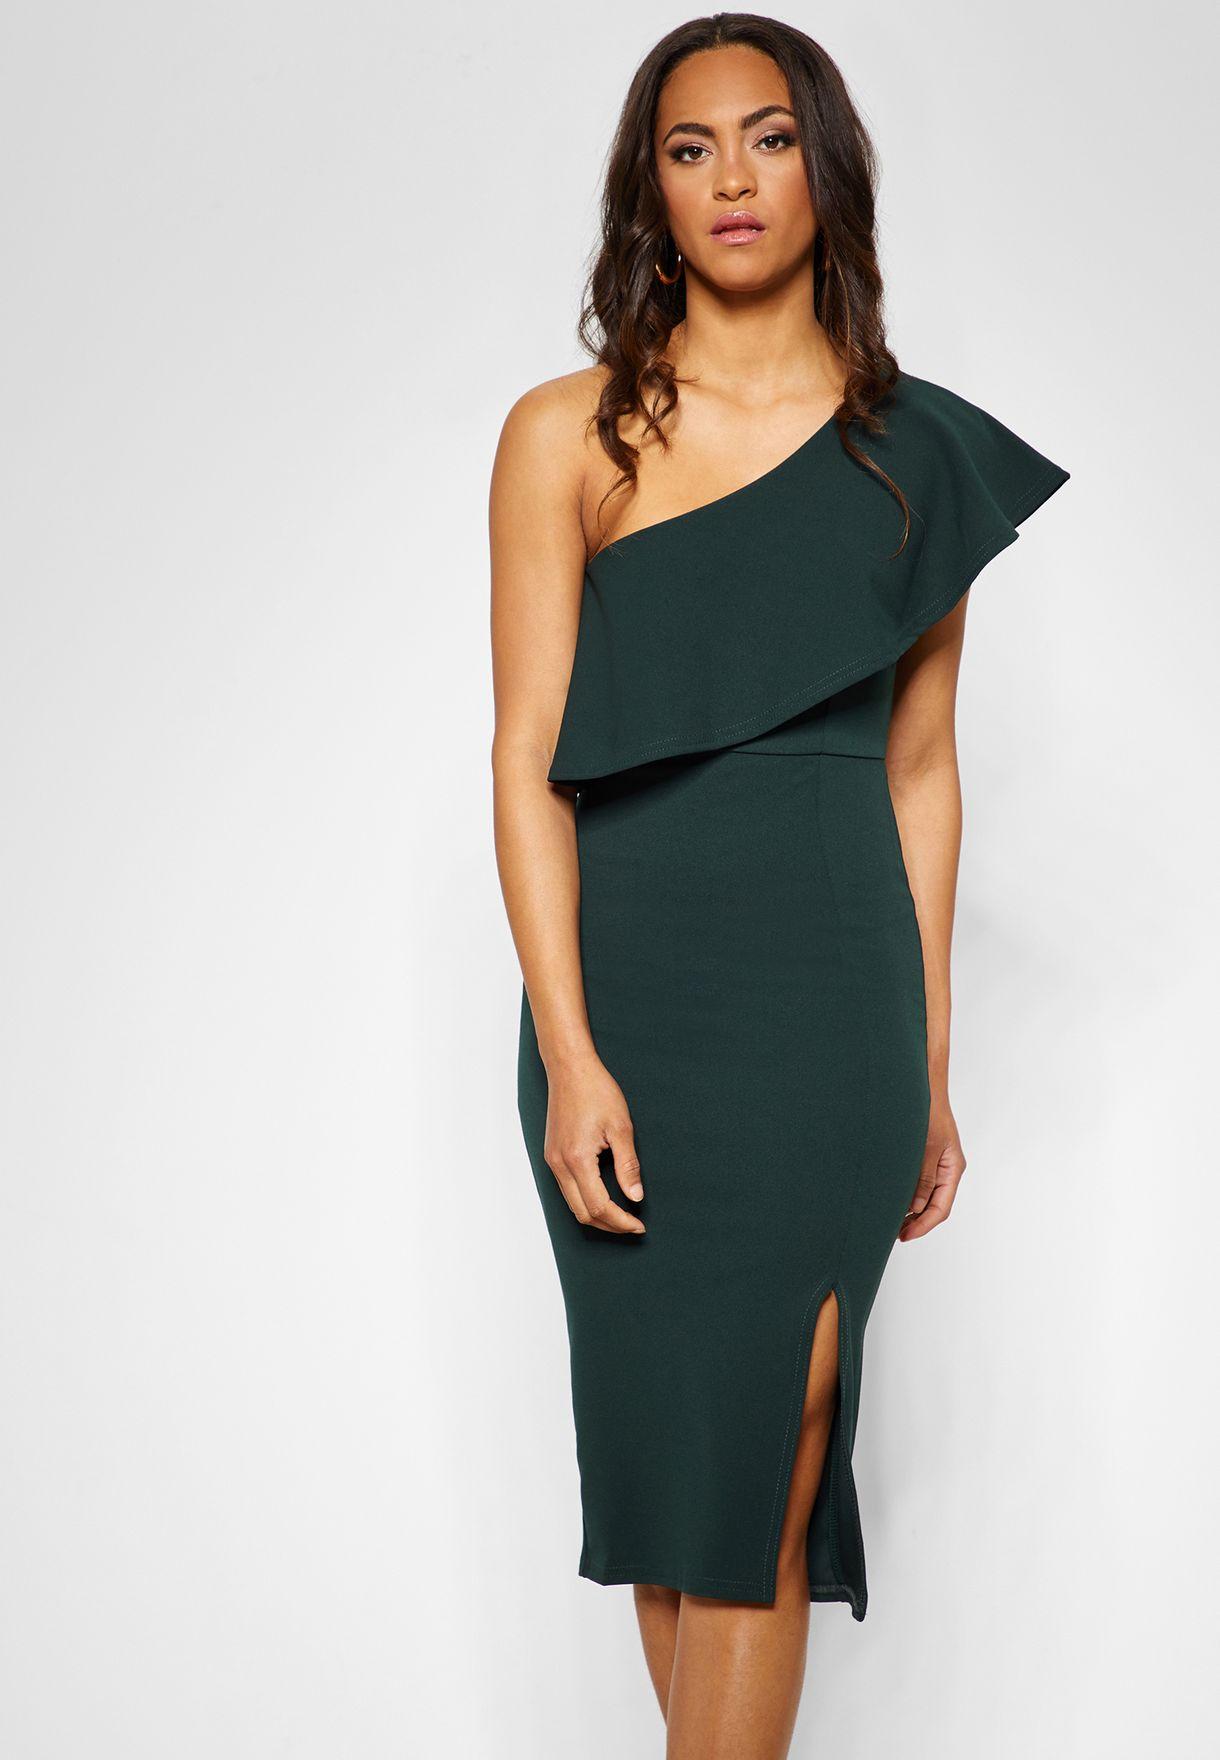 6b1922907915 Shop Missguided green One Shoulder Side Slit Bodycon Dress DE925019 ...